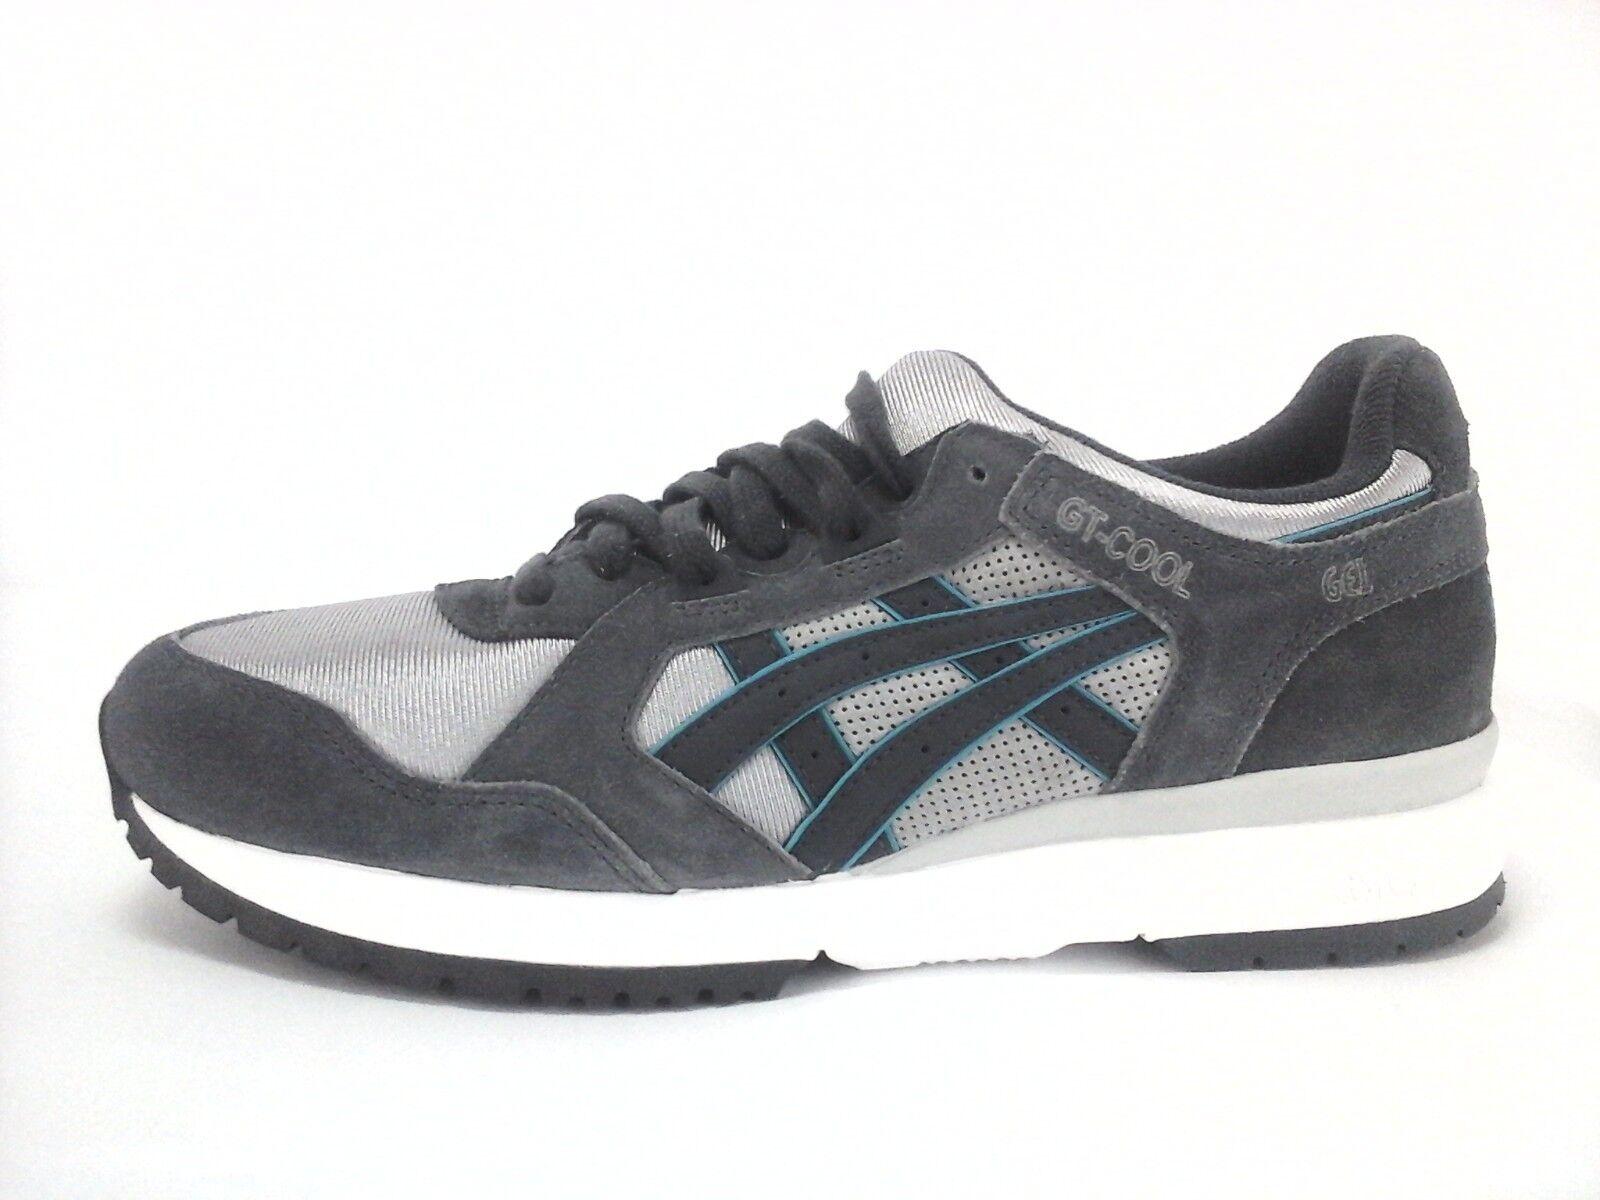 f7626f840eab Asics GT-Cool Men s Retro Shoes Sneakers Light Grey   Dark Grey H402N-1316  NIB